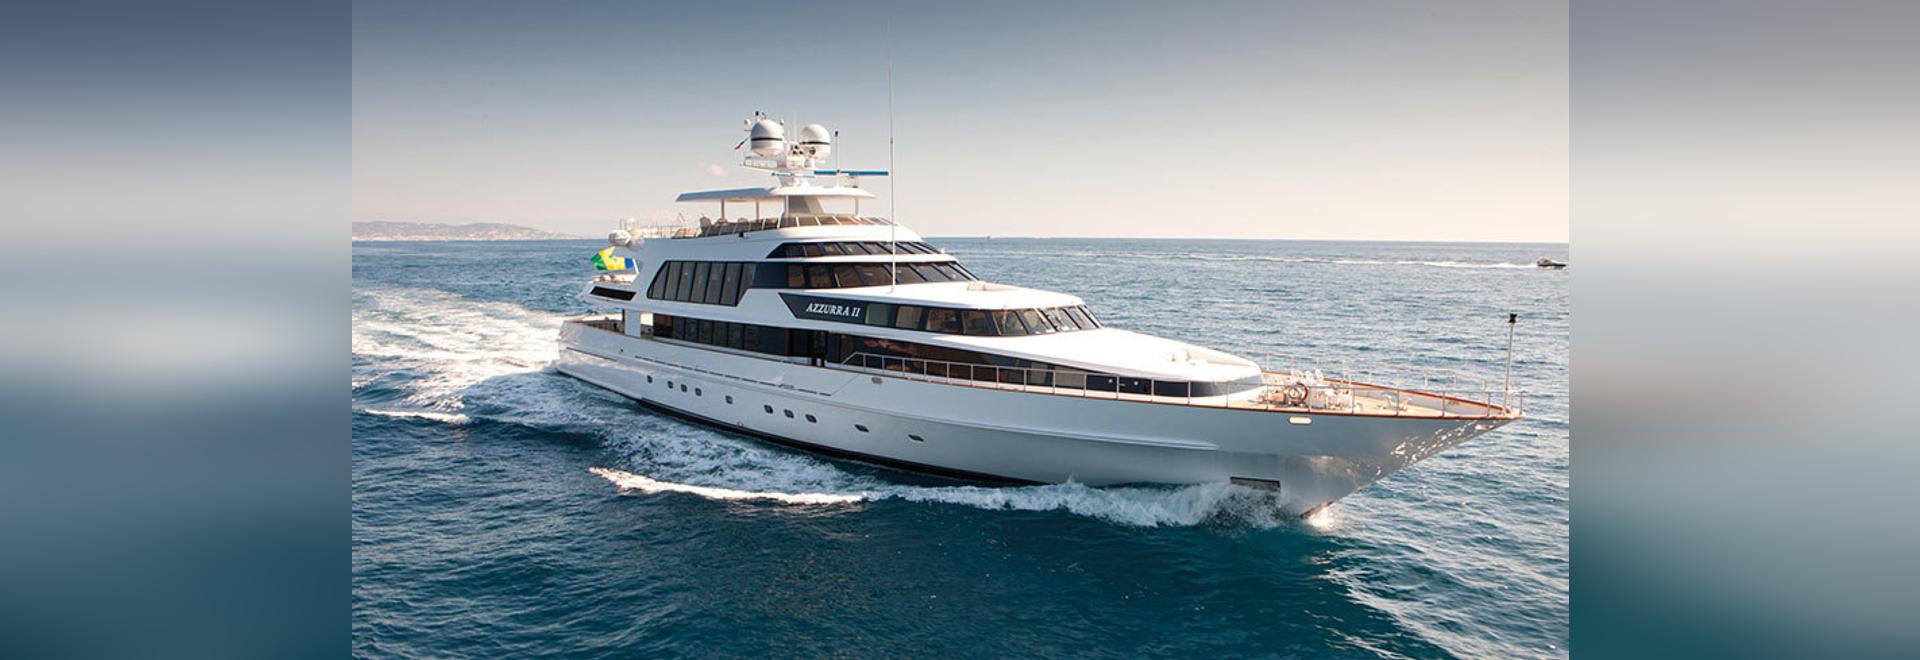 48m CRN motor yacht Azzurra II for sale